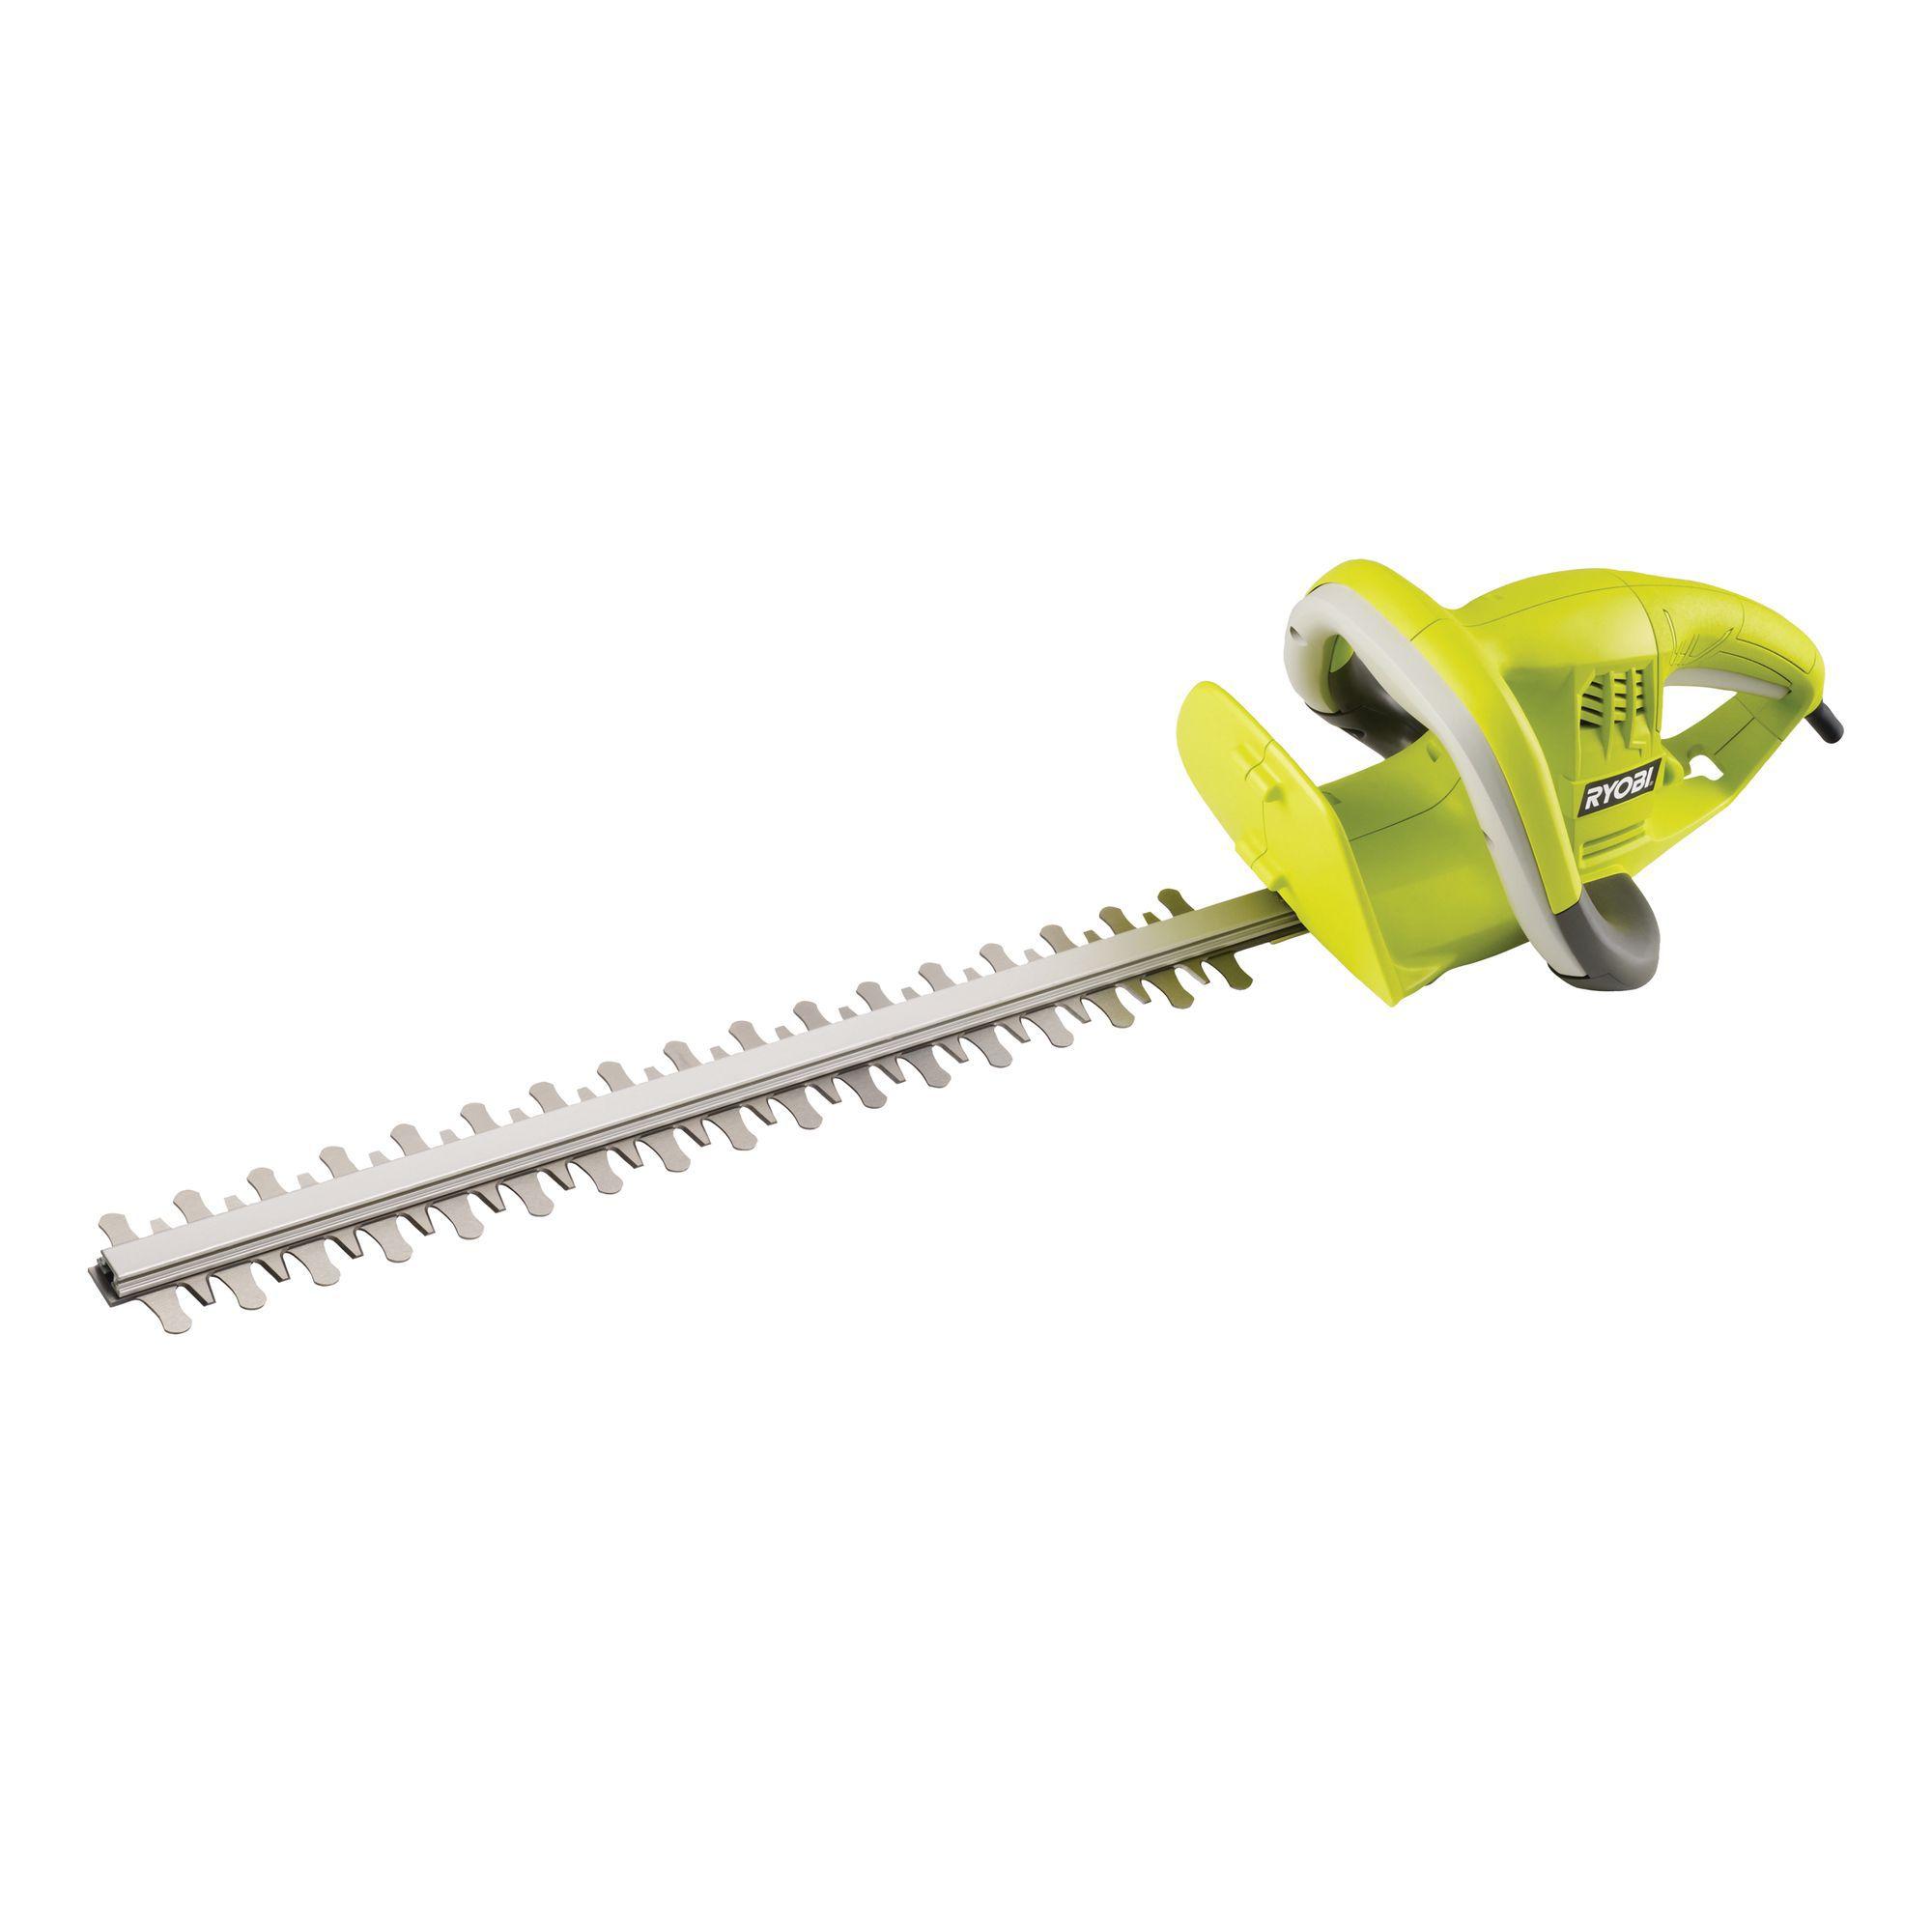 Ryobi Rht4245 Electric Hedge Trimmer